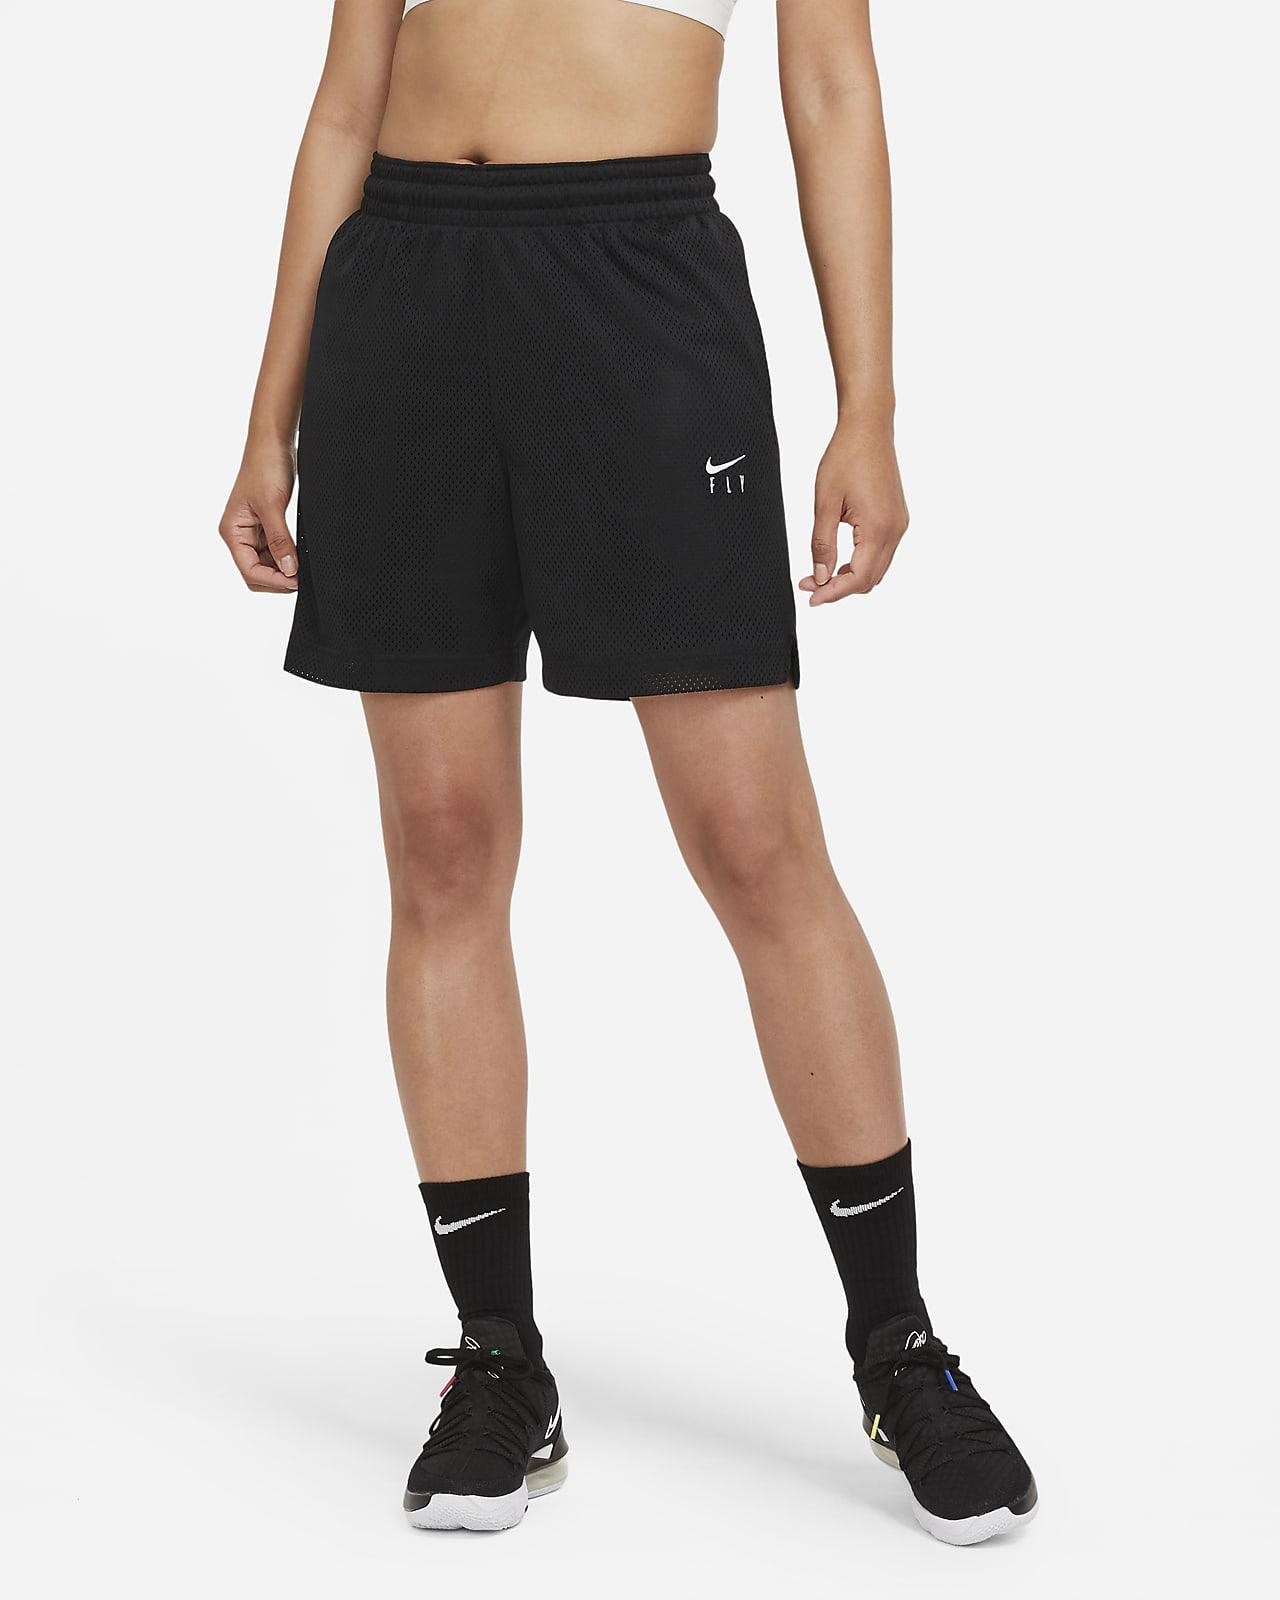 Nike Fly Women's Basketball Shorts